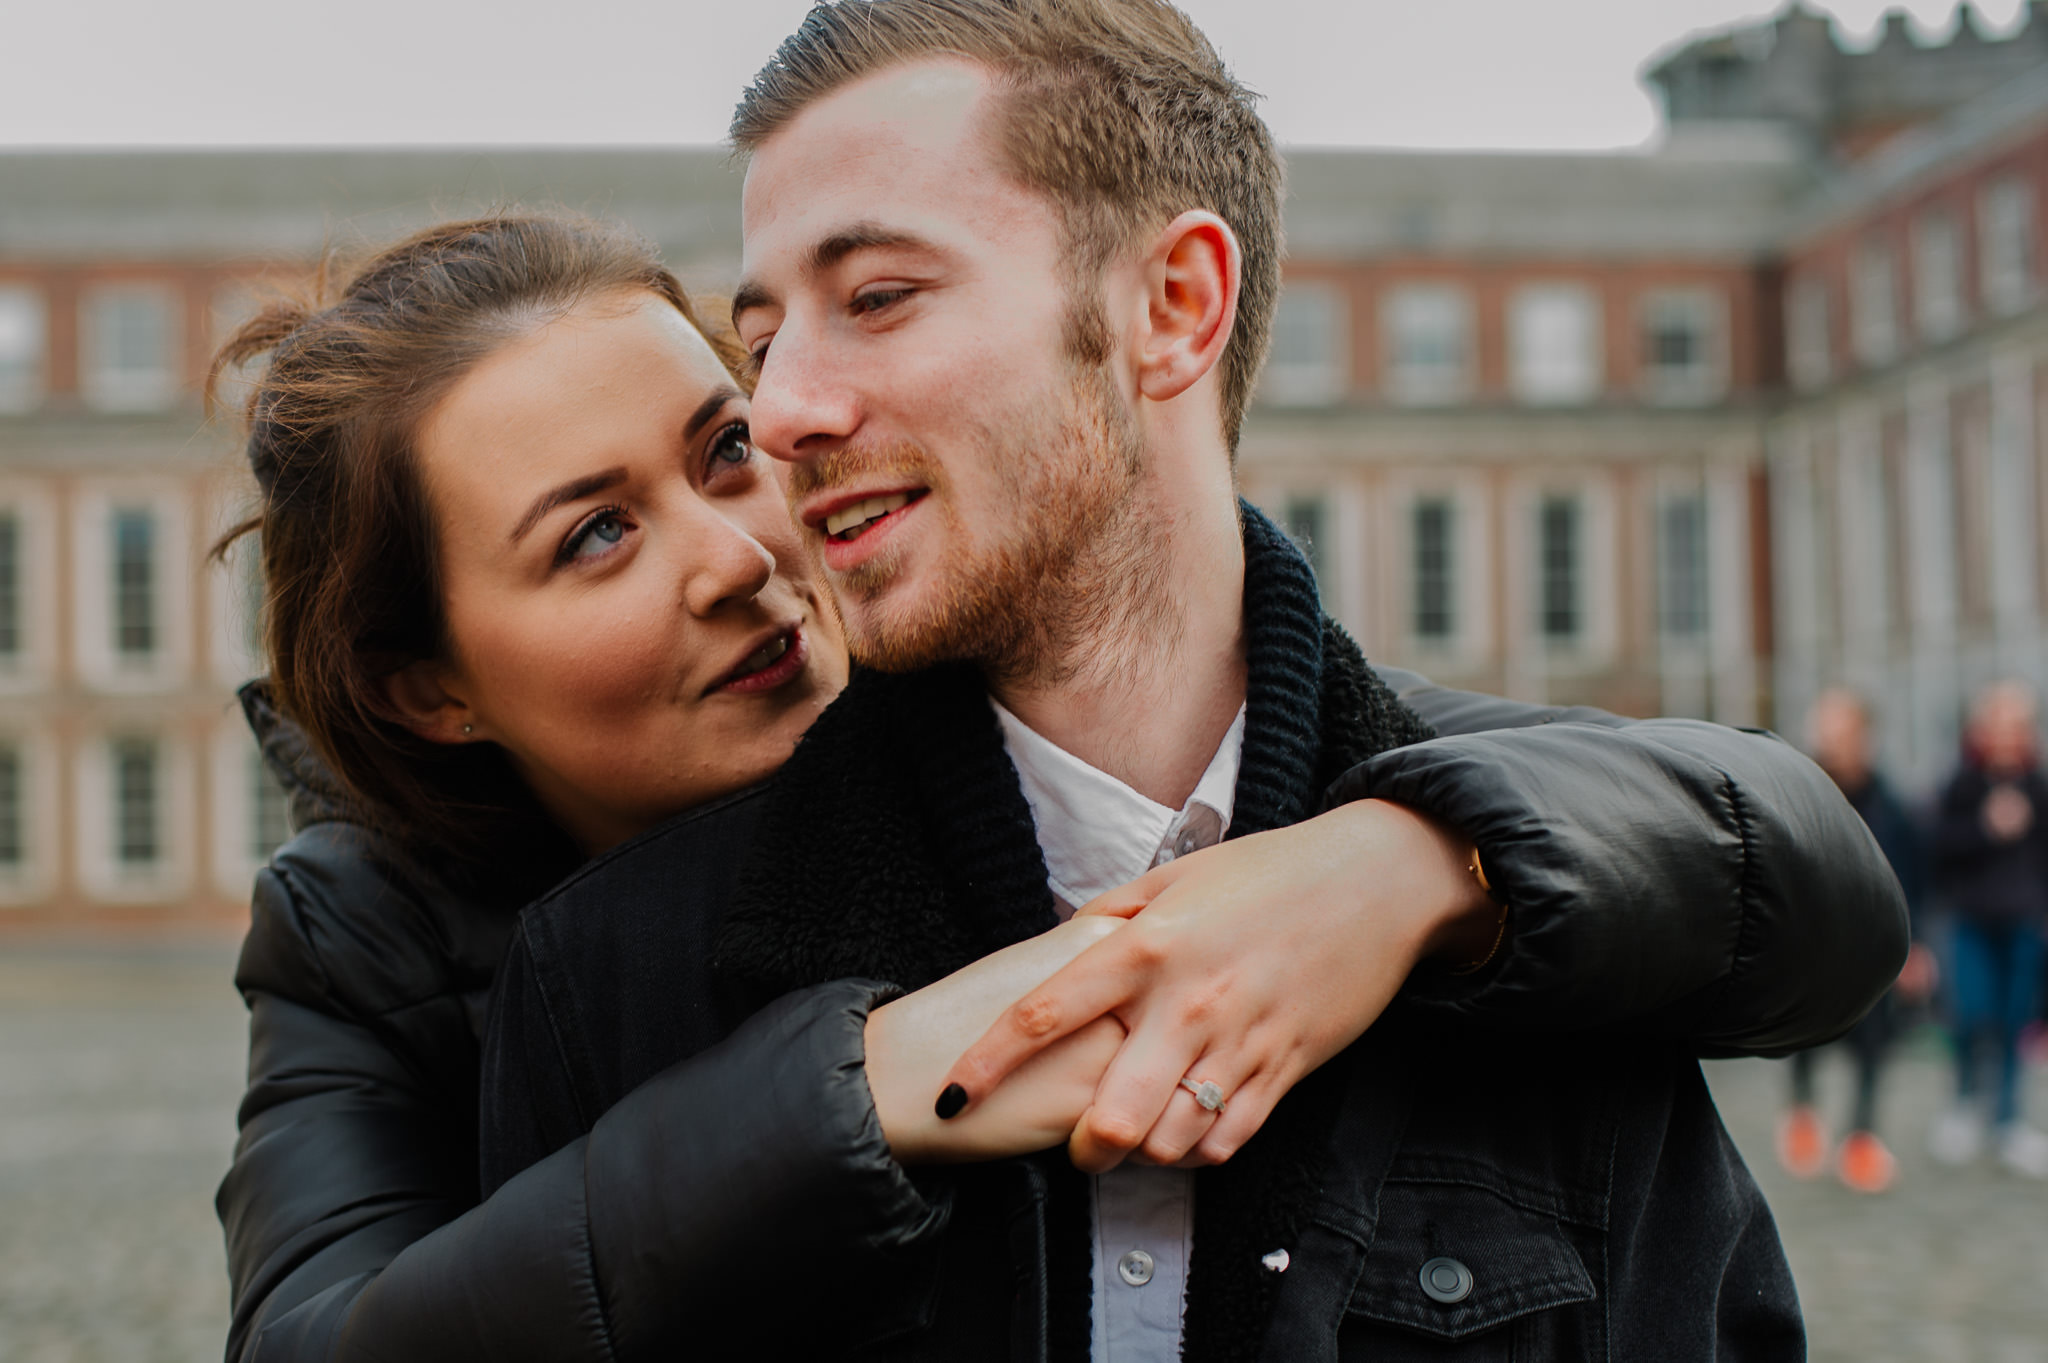 DublinCityEngagementPhotographyIreland-65.jpg